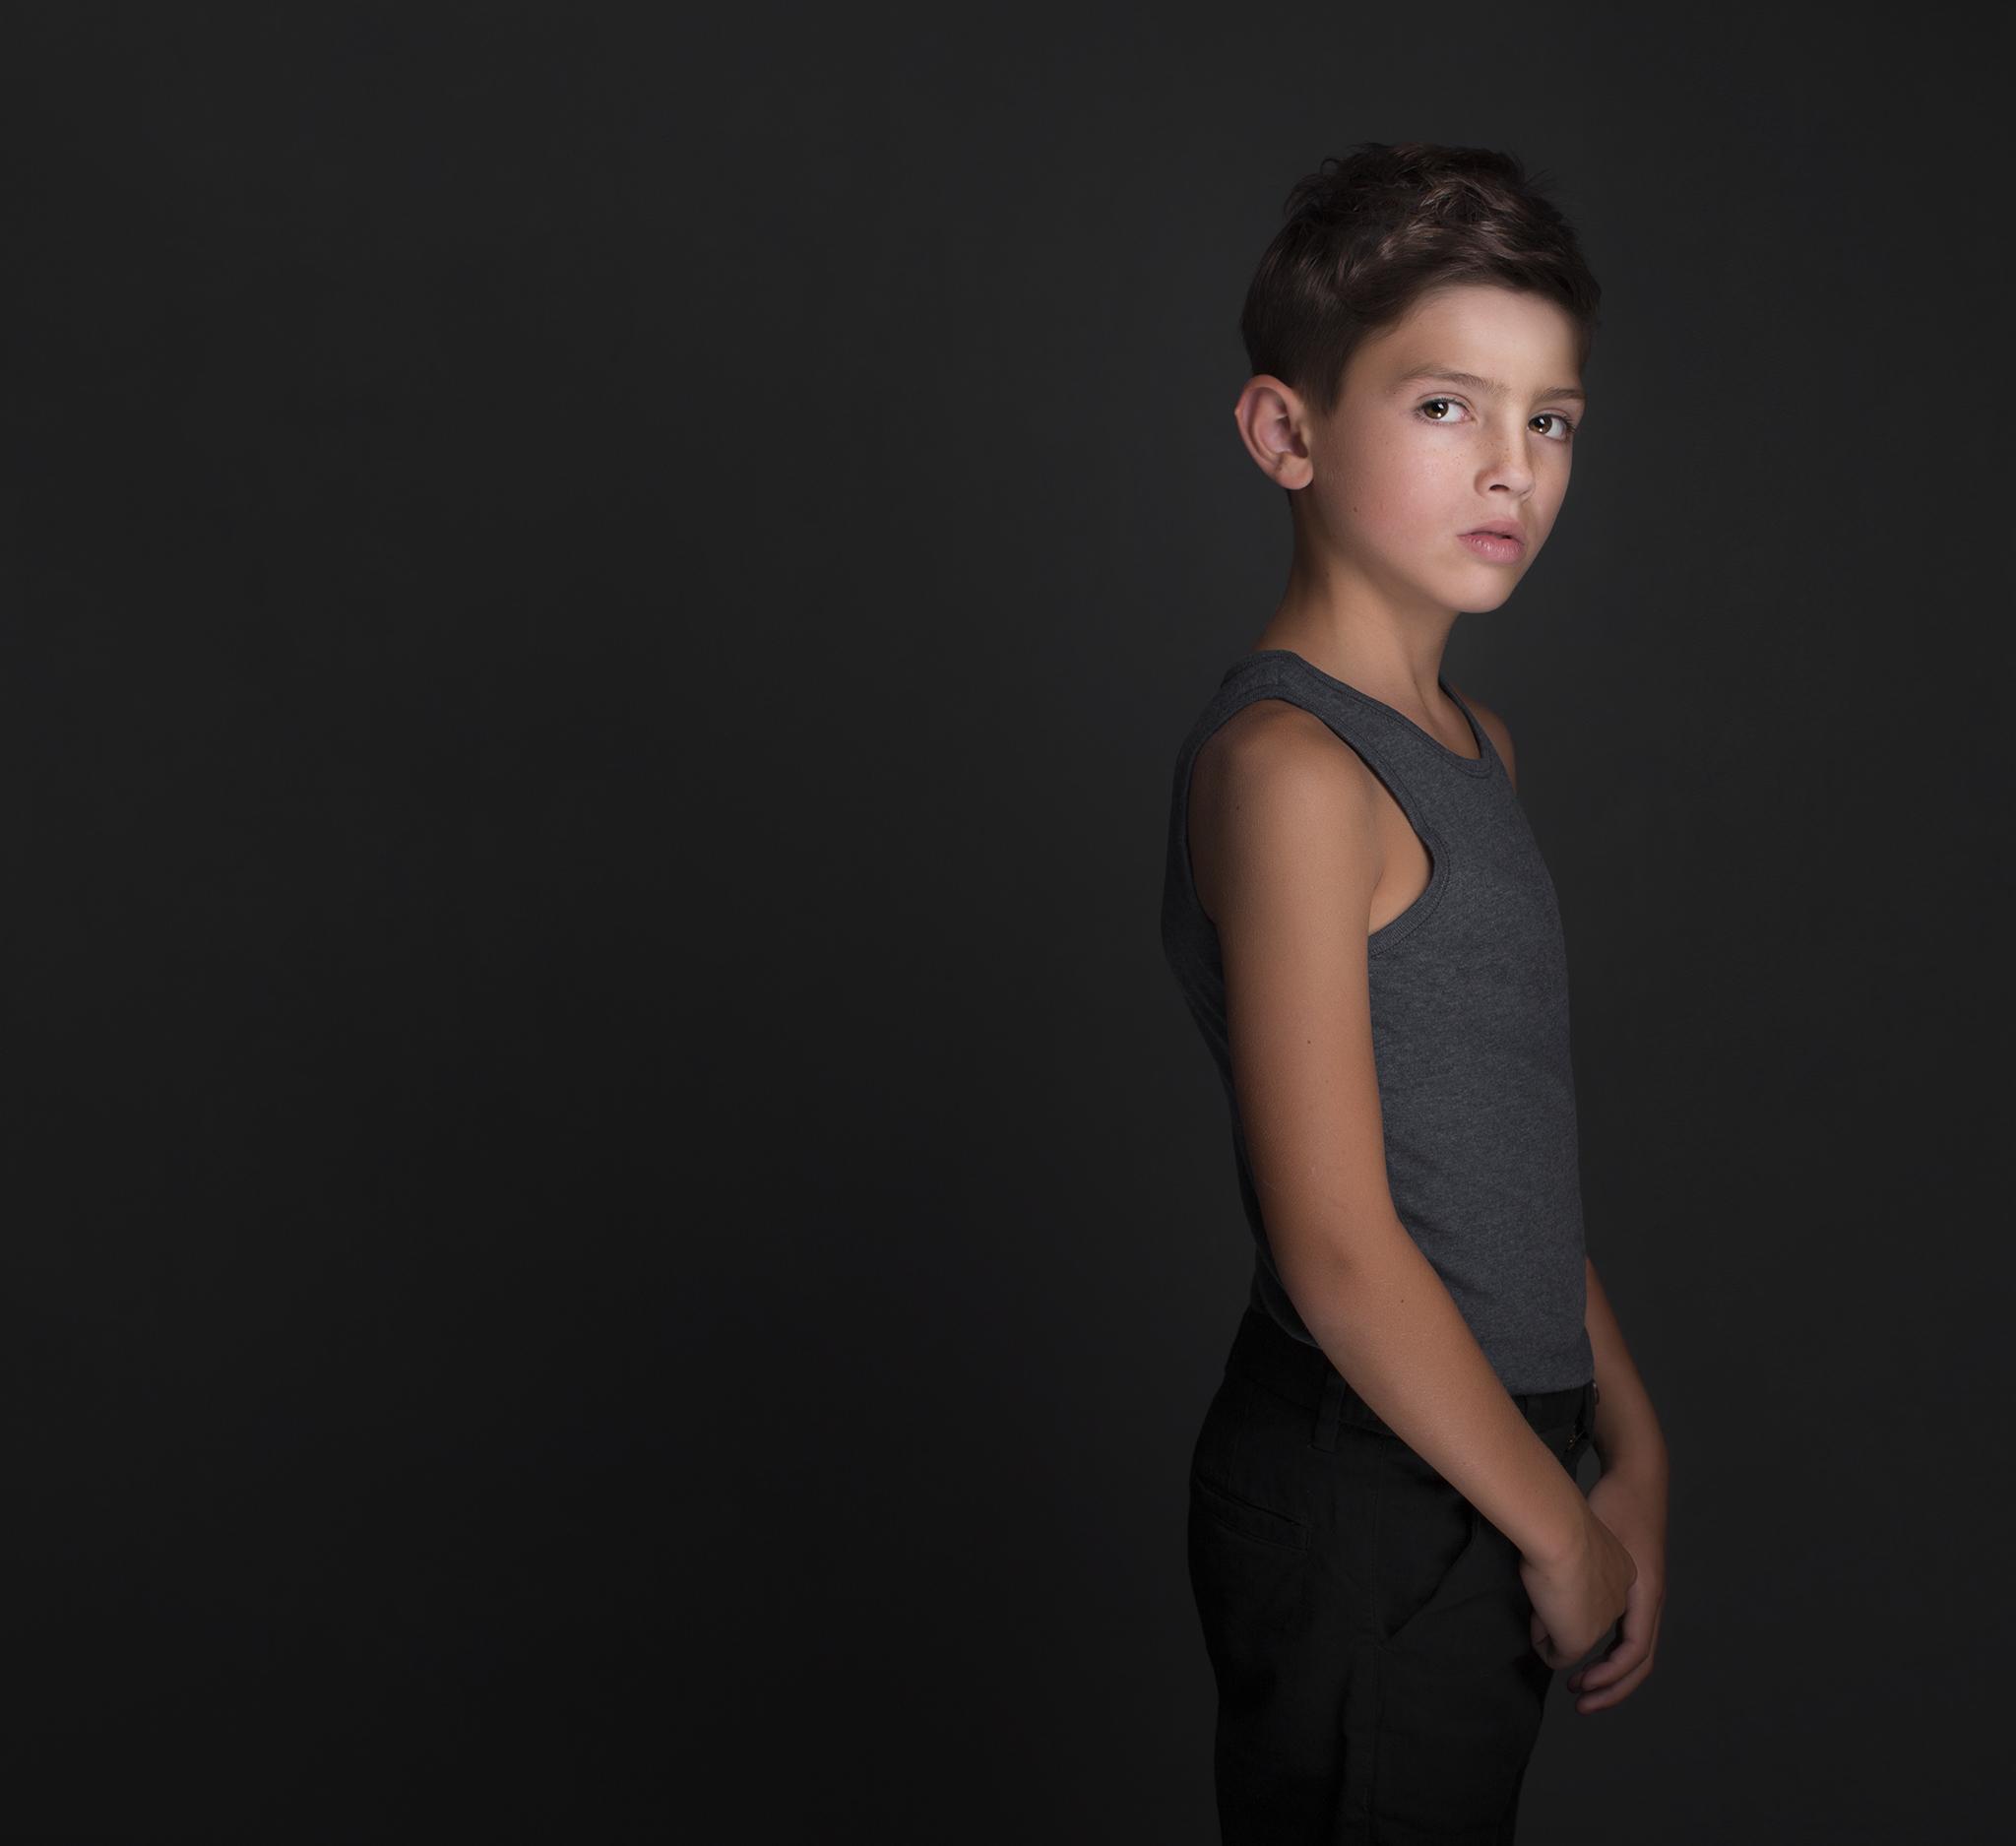 elizabethgfineartphotography_kingslangley_model_actor_jack_mentormodel_rayandrobin_3.jpg